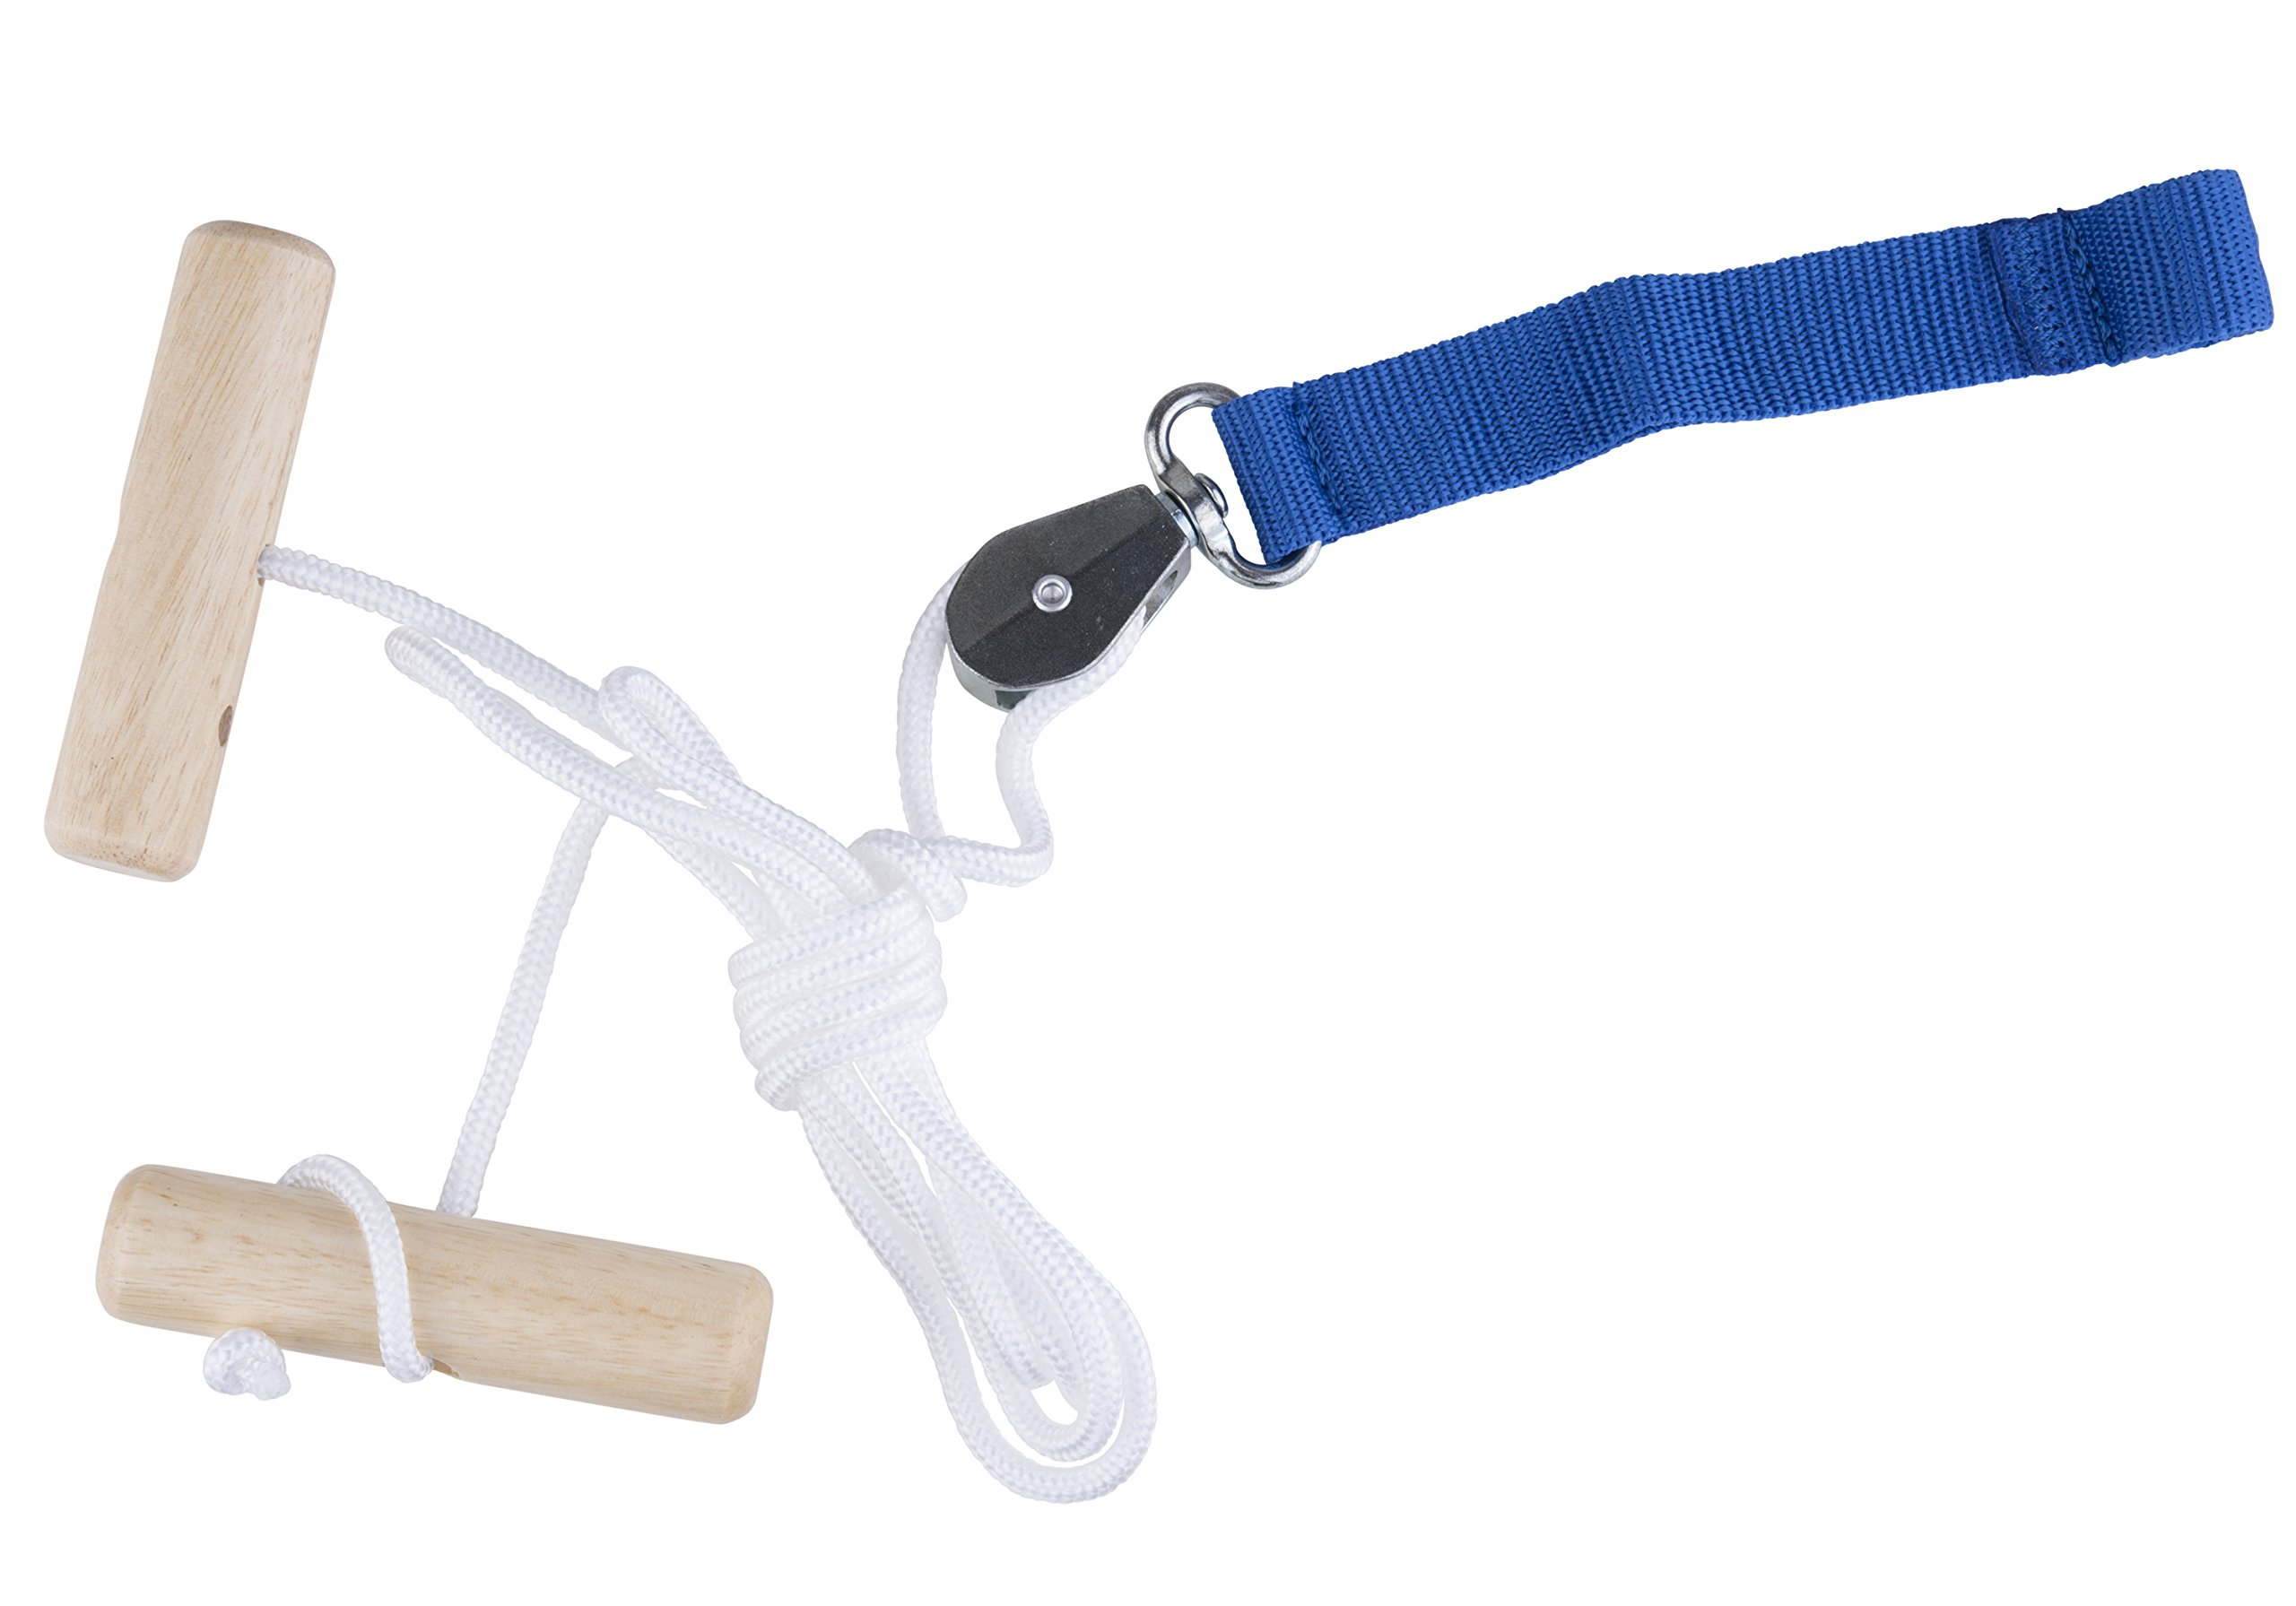 Overhead Overdoor Shoulder Pulley Therapy Exercise System - Wooden Handles With Webbing Door Strap